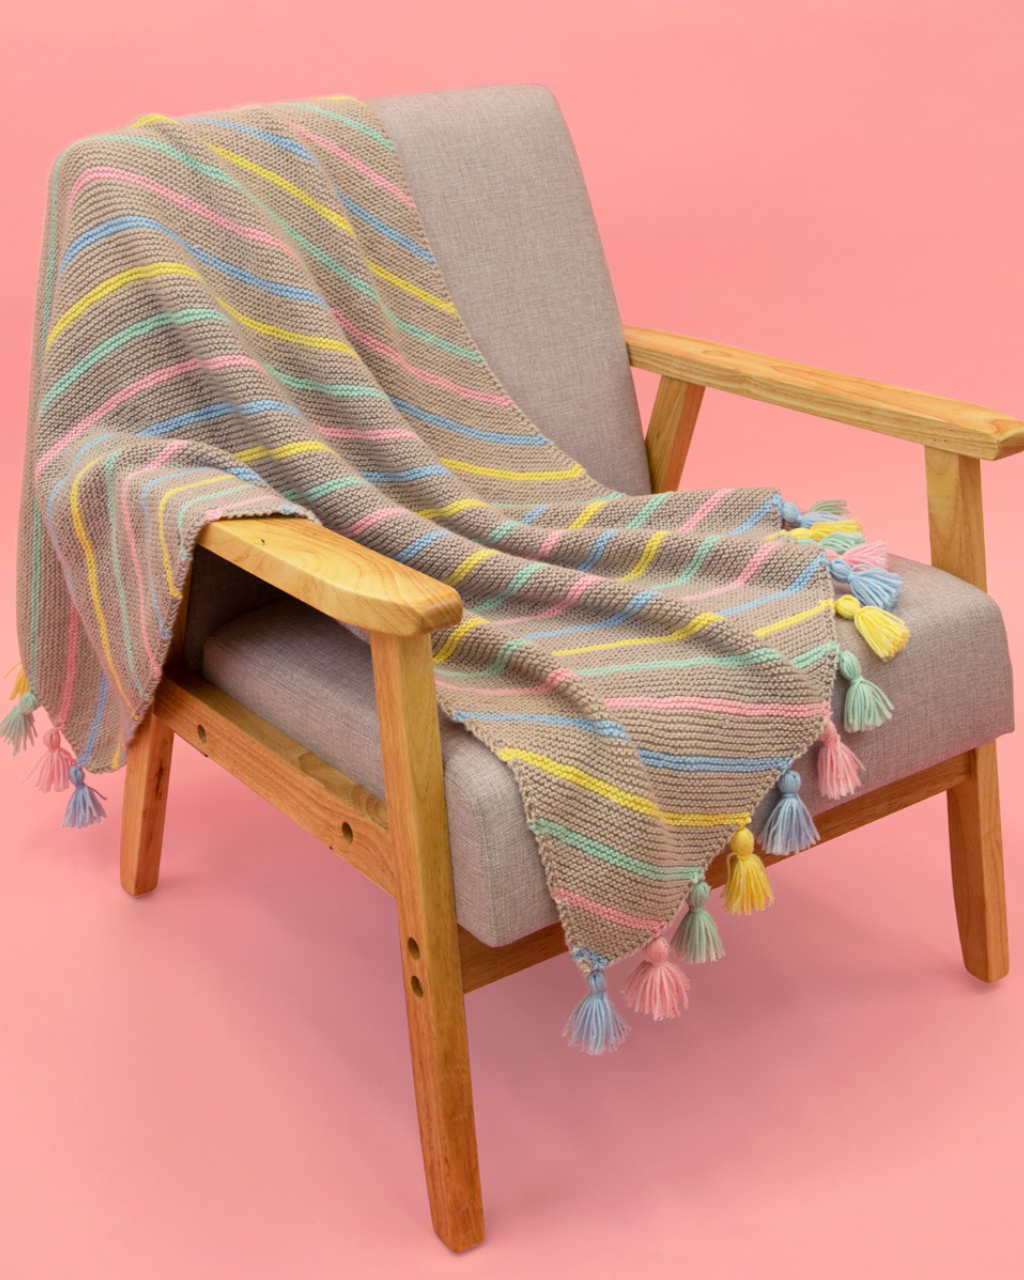 Baby Soft 8ply - Diagonal Stripe Blanket